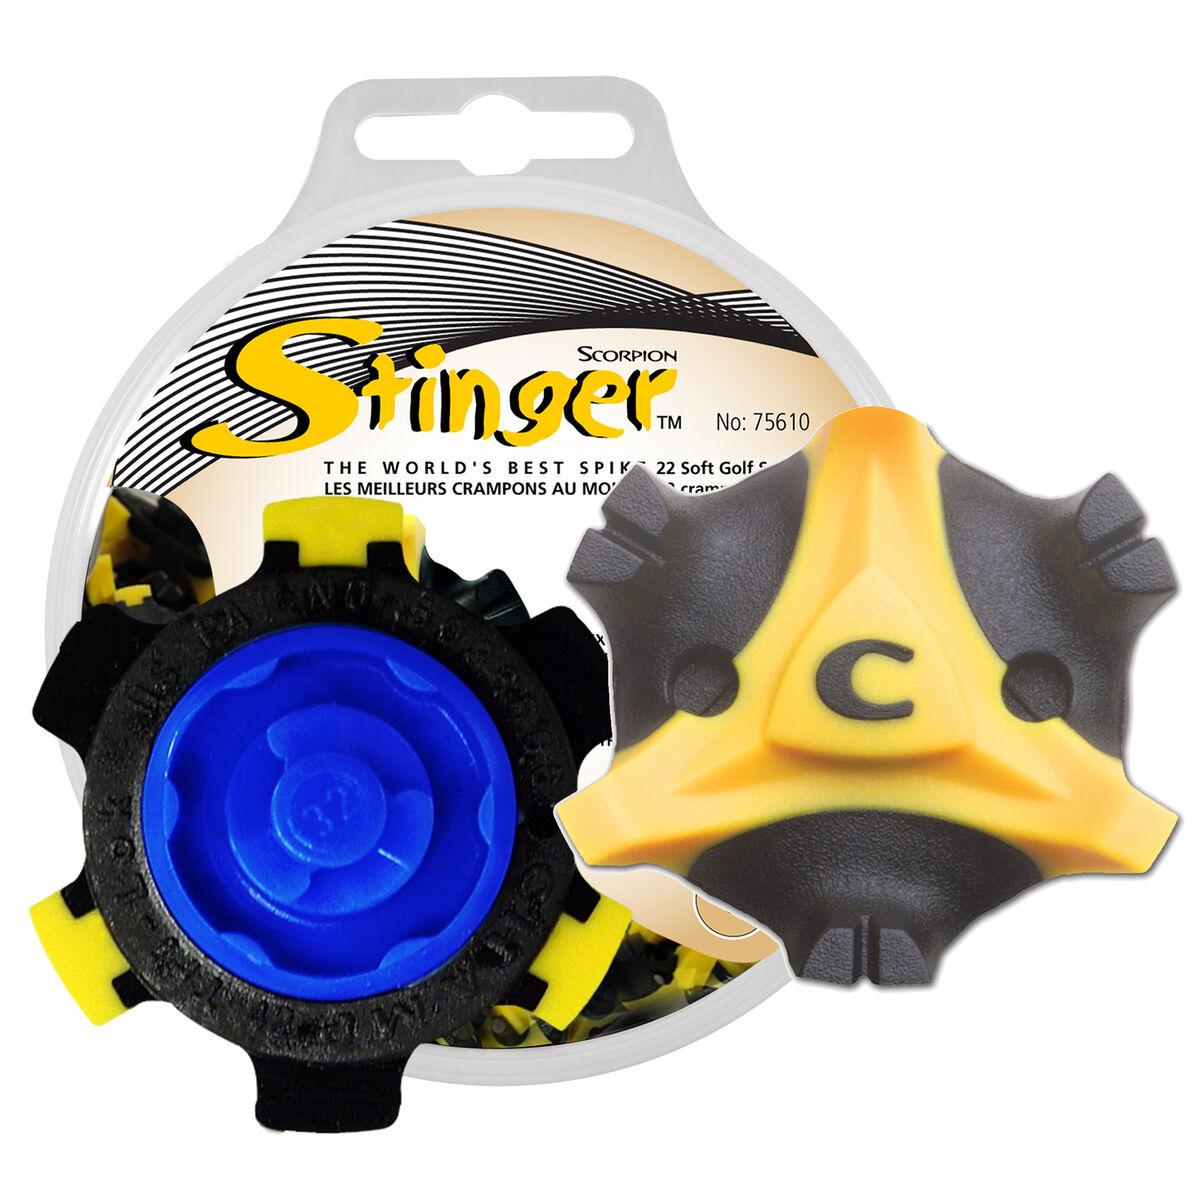 7cd898f8fad Stinger Tri-Lok Spikes  Find Stinger Golf Shoe Accessories